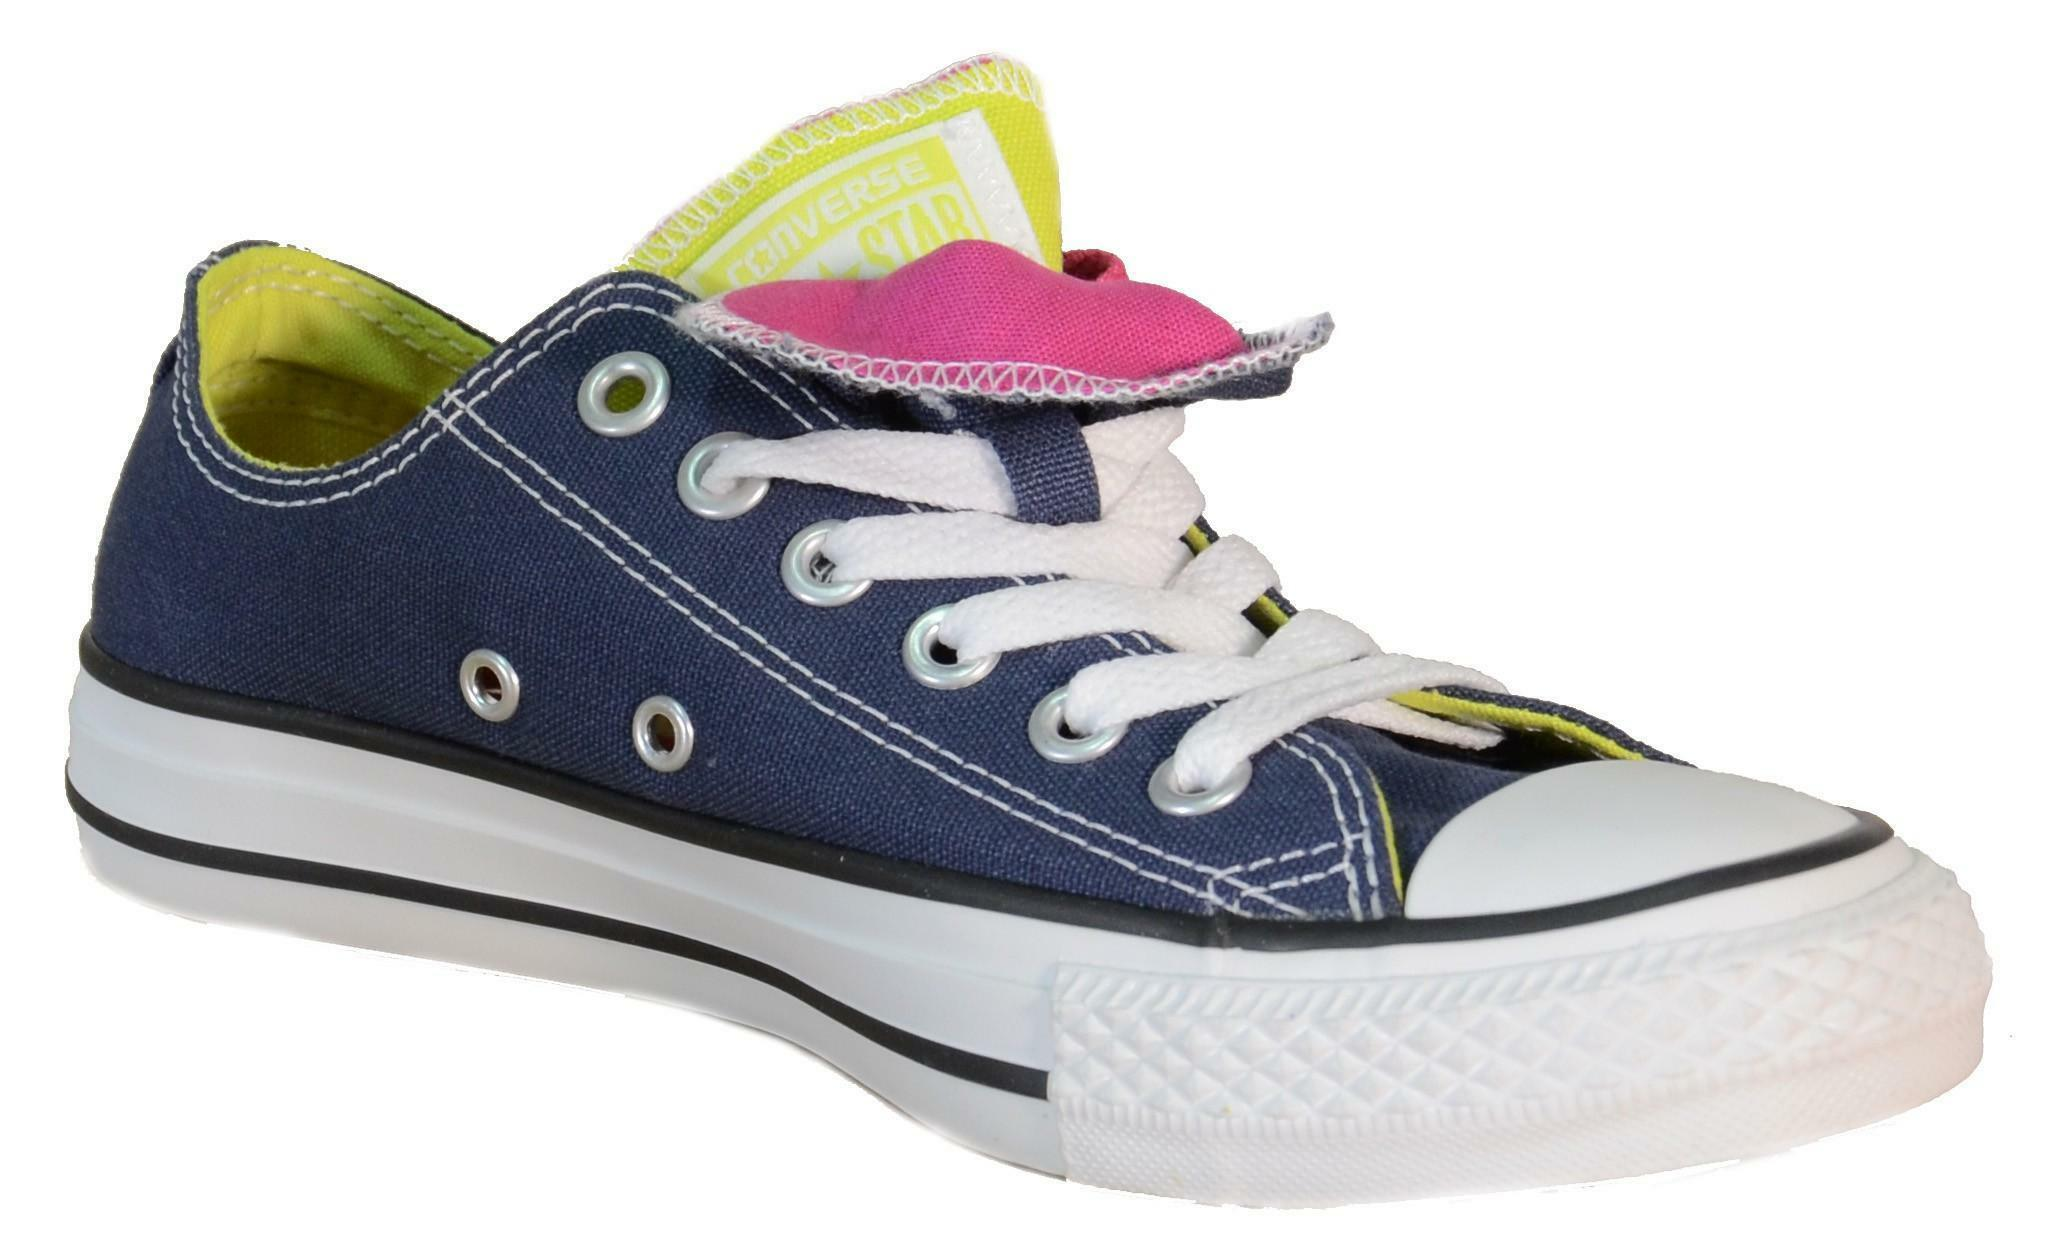 converse converse all star ct dbl tng ox navy scarpe donna blu tela 143330c